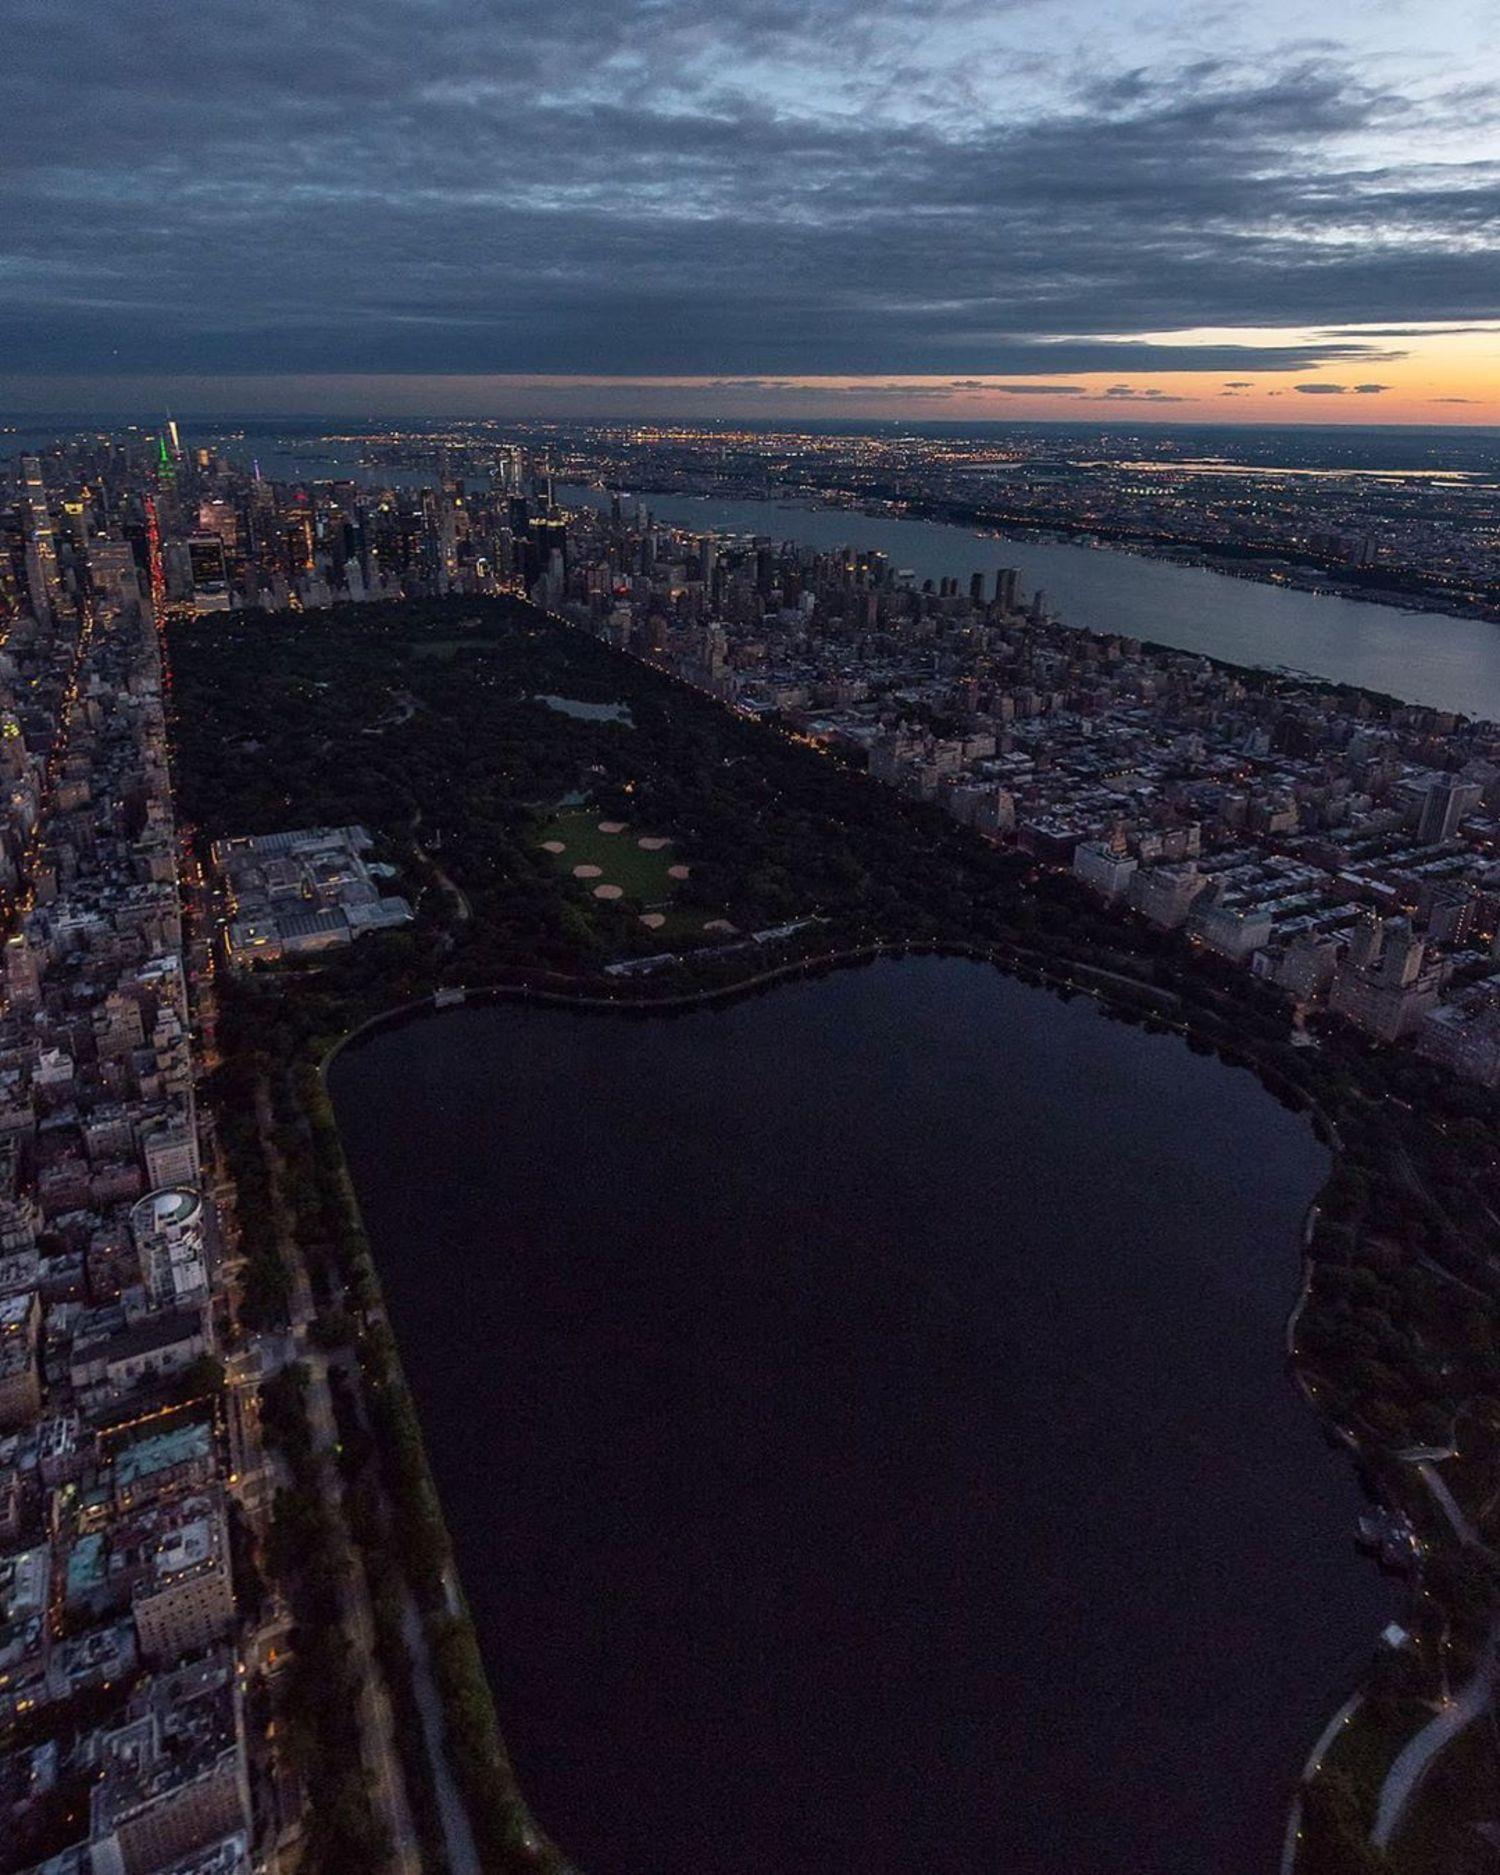 Dusk over Central Park, Manhattan